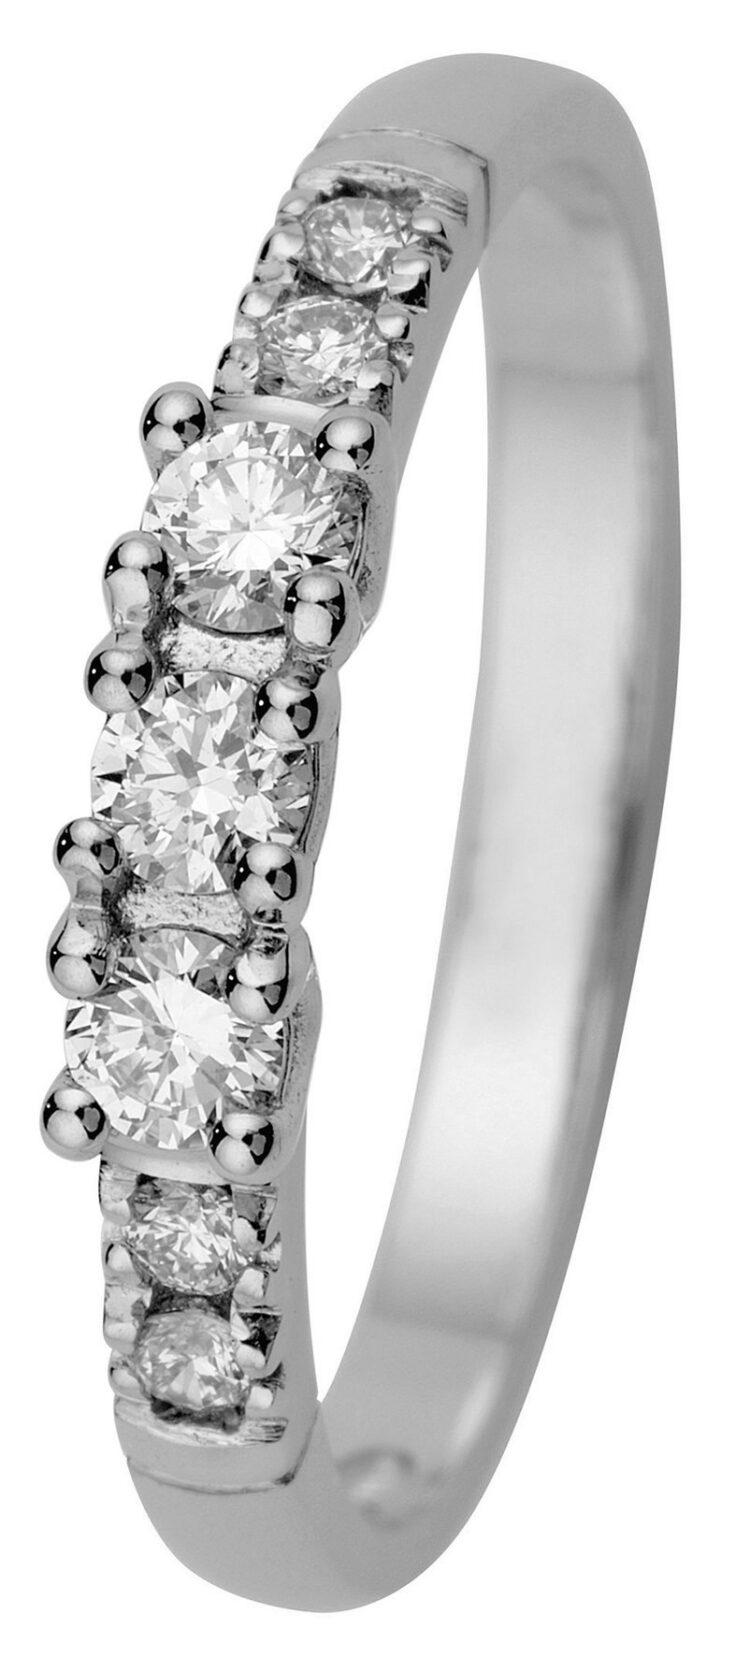 Estelle valkokultainen timanttisormus